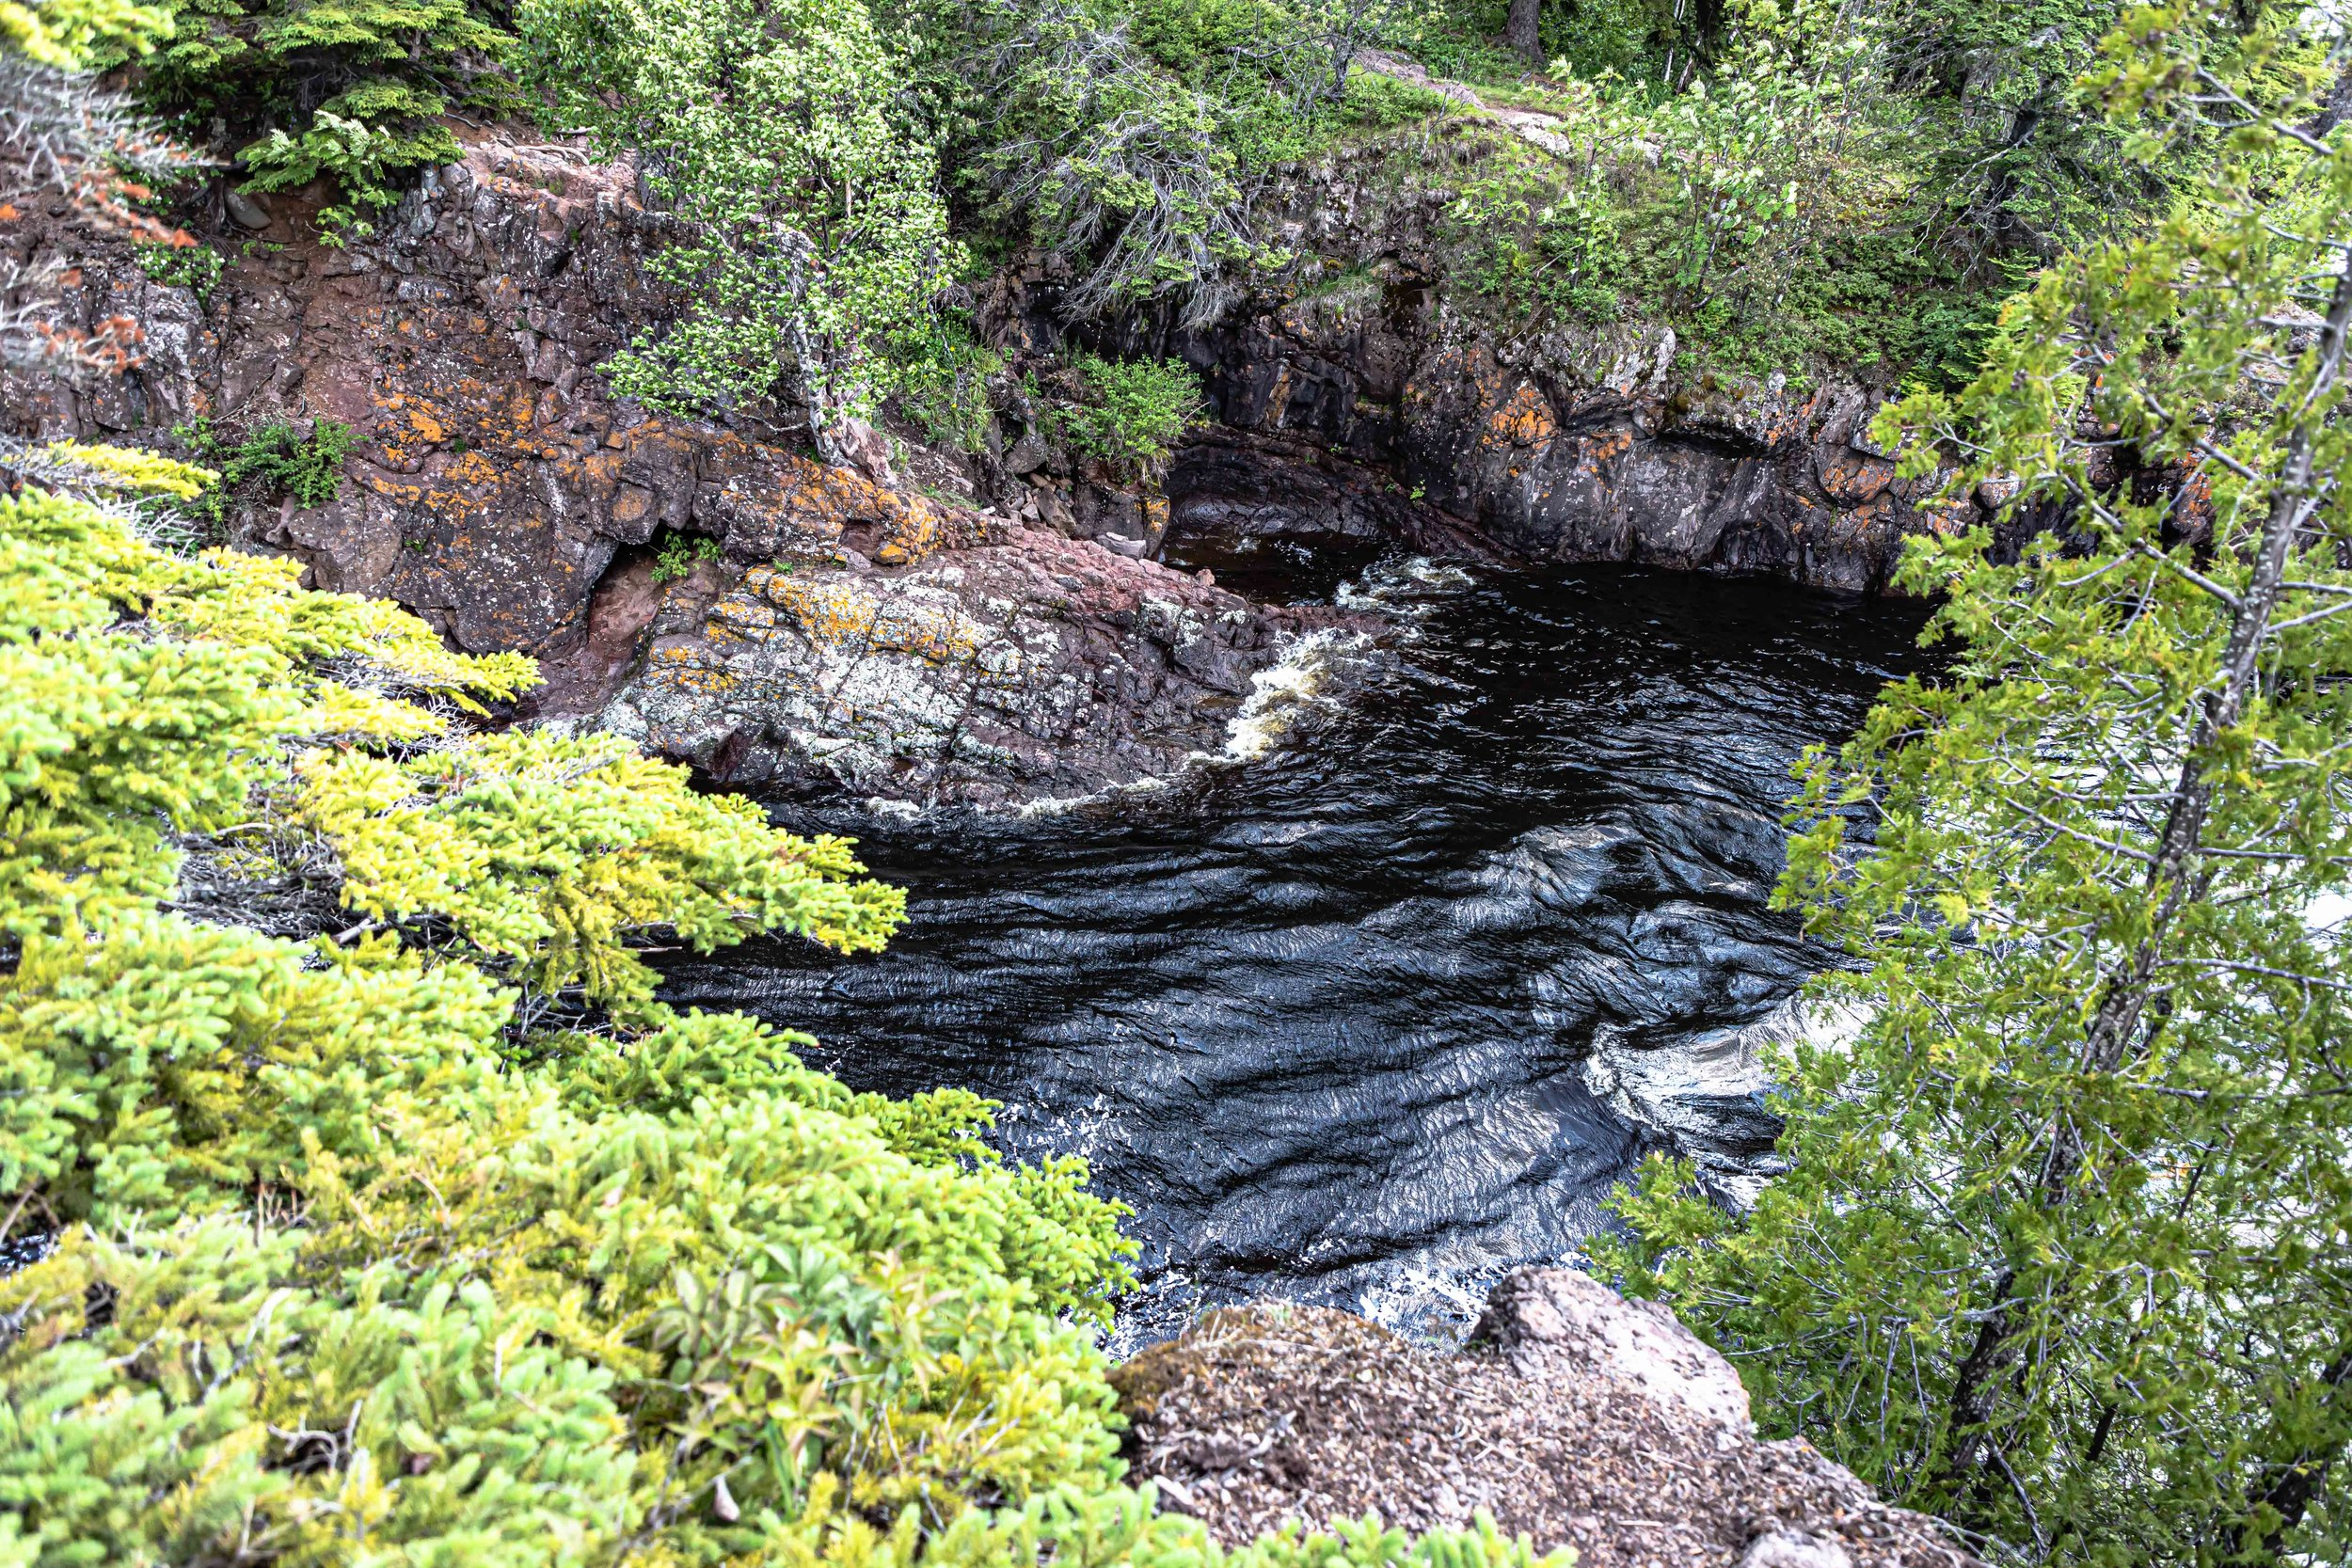 Minnesota North Shore: Seeking Lake Superior